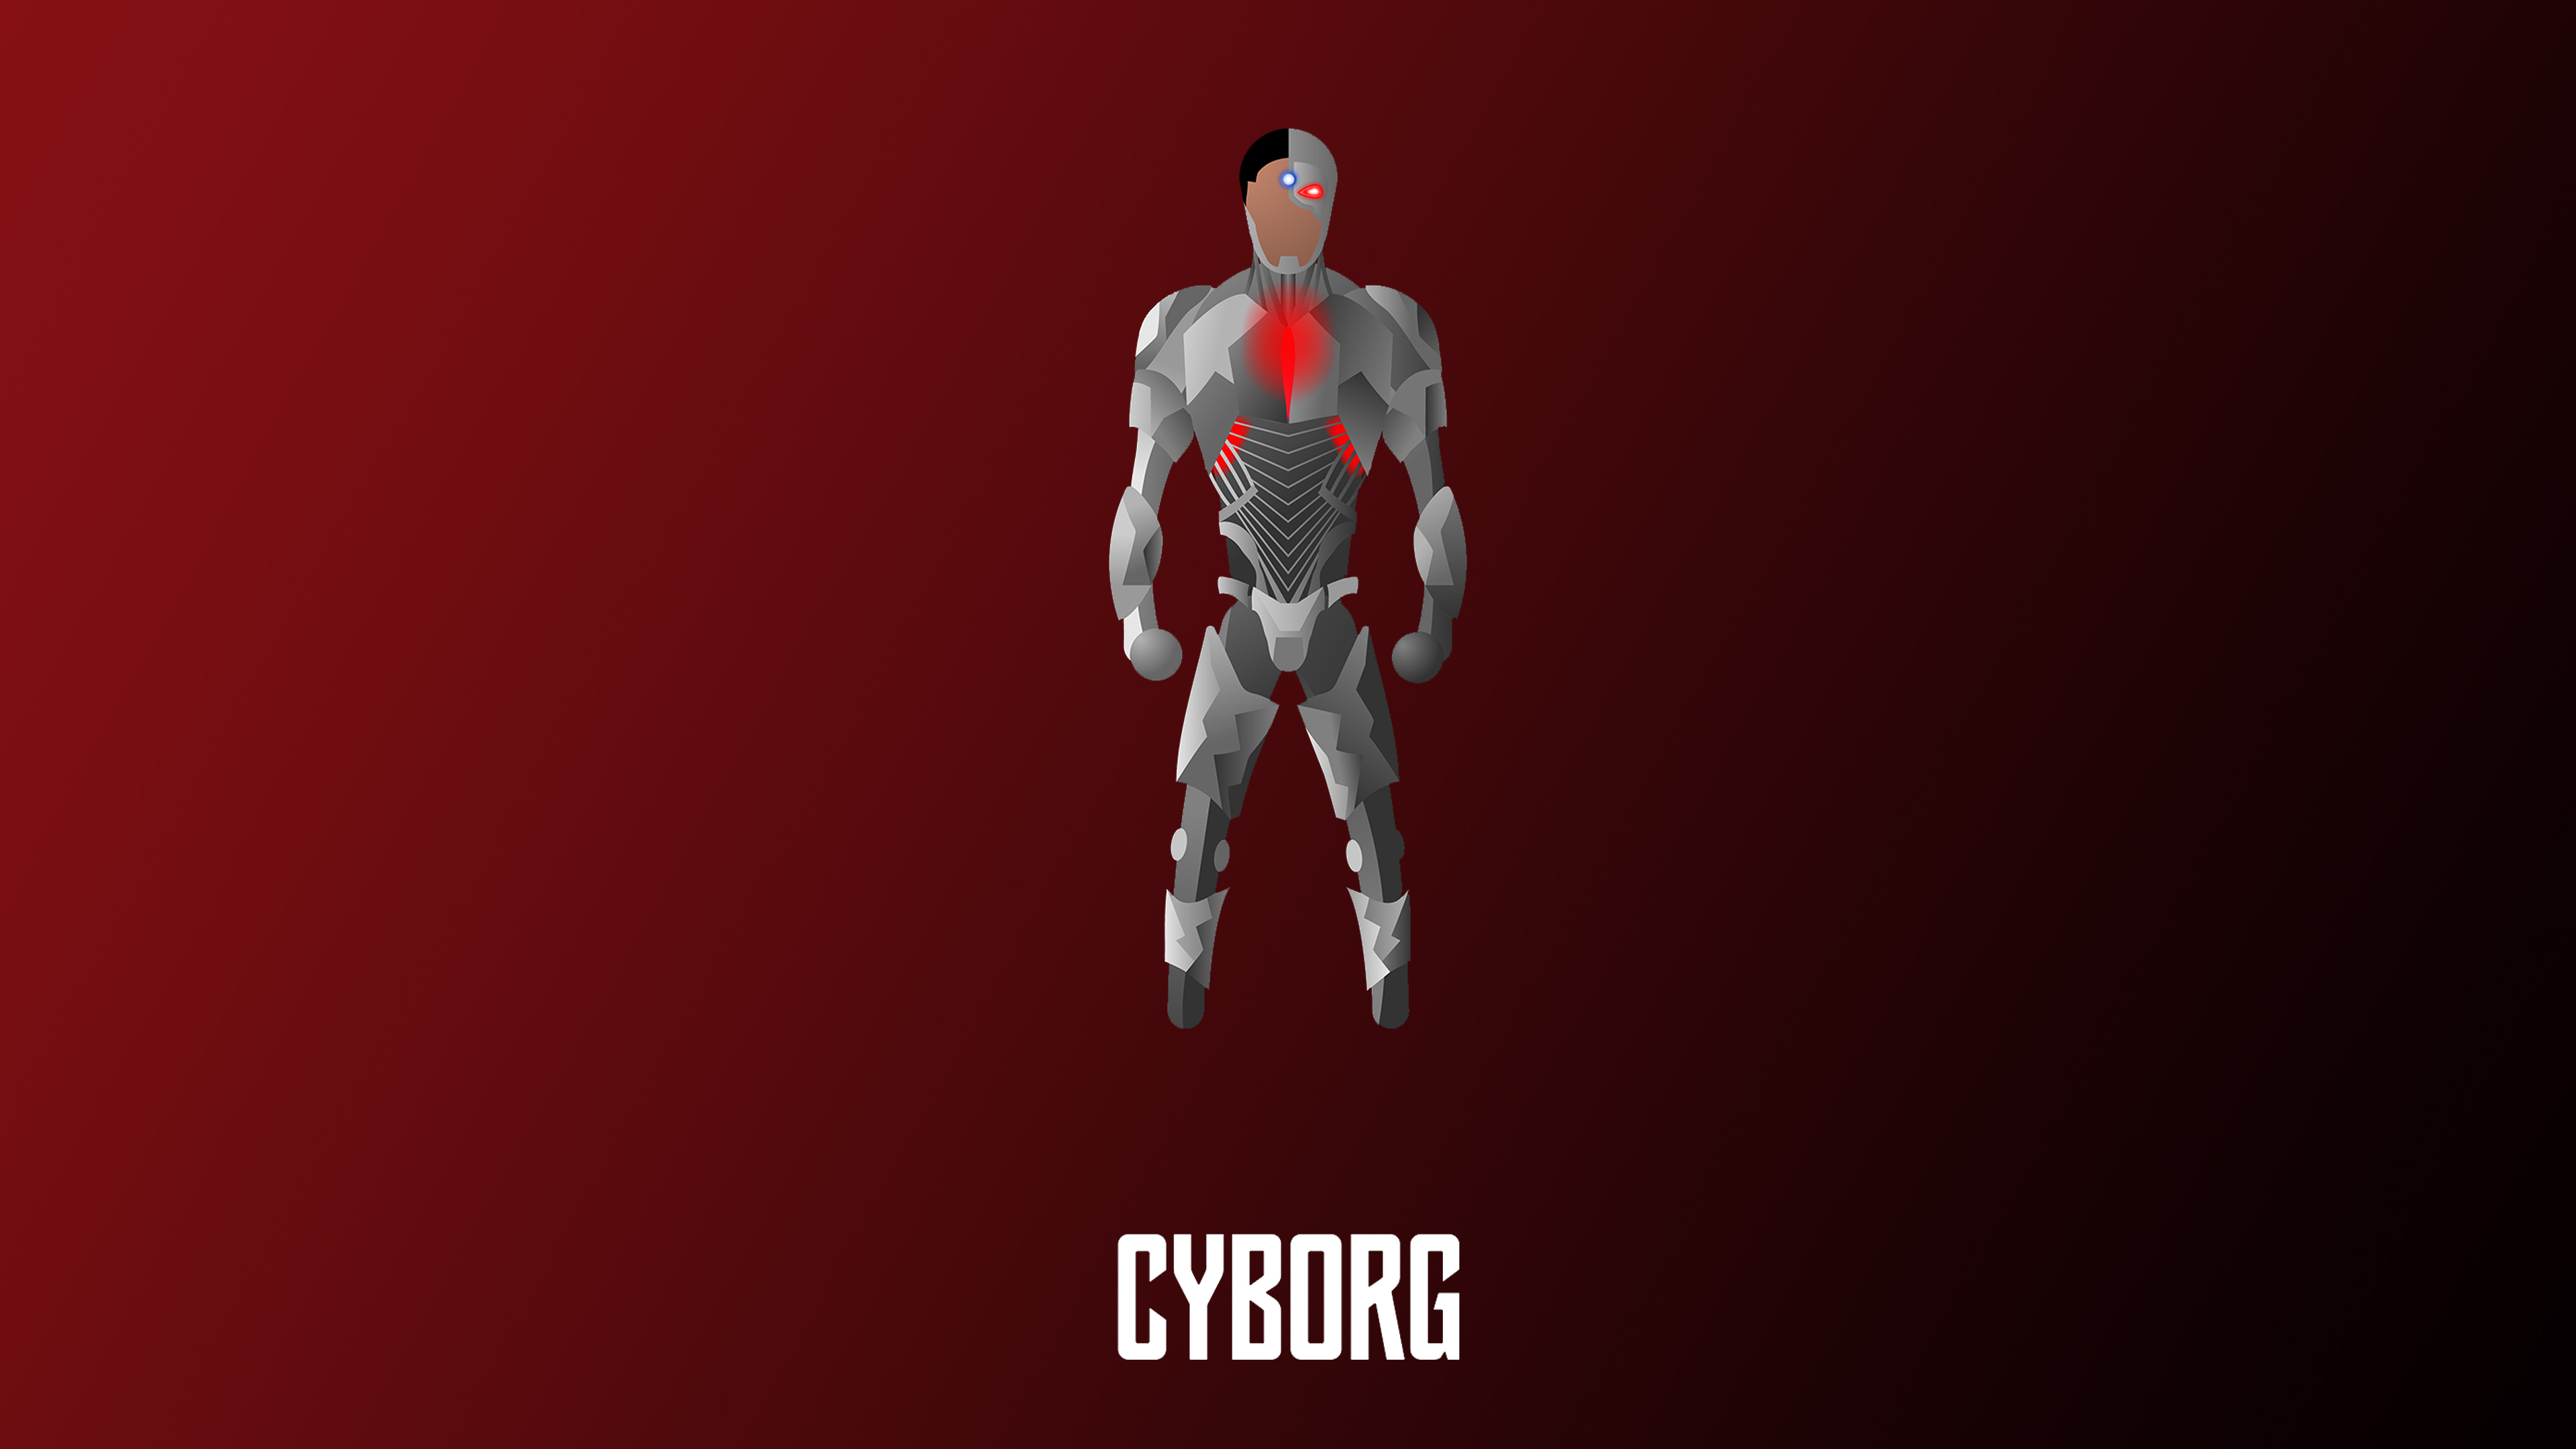 Rajat 3d Wallpaper Cyborg Illustration 4k Hd Superheroes 4k Wallpapers